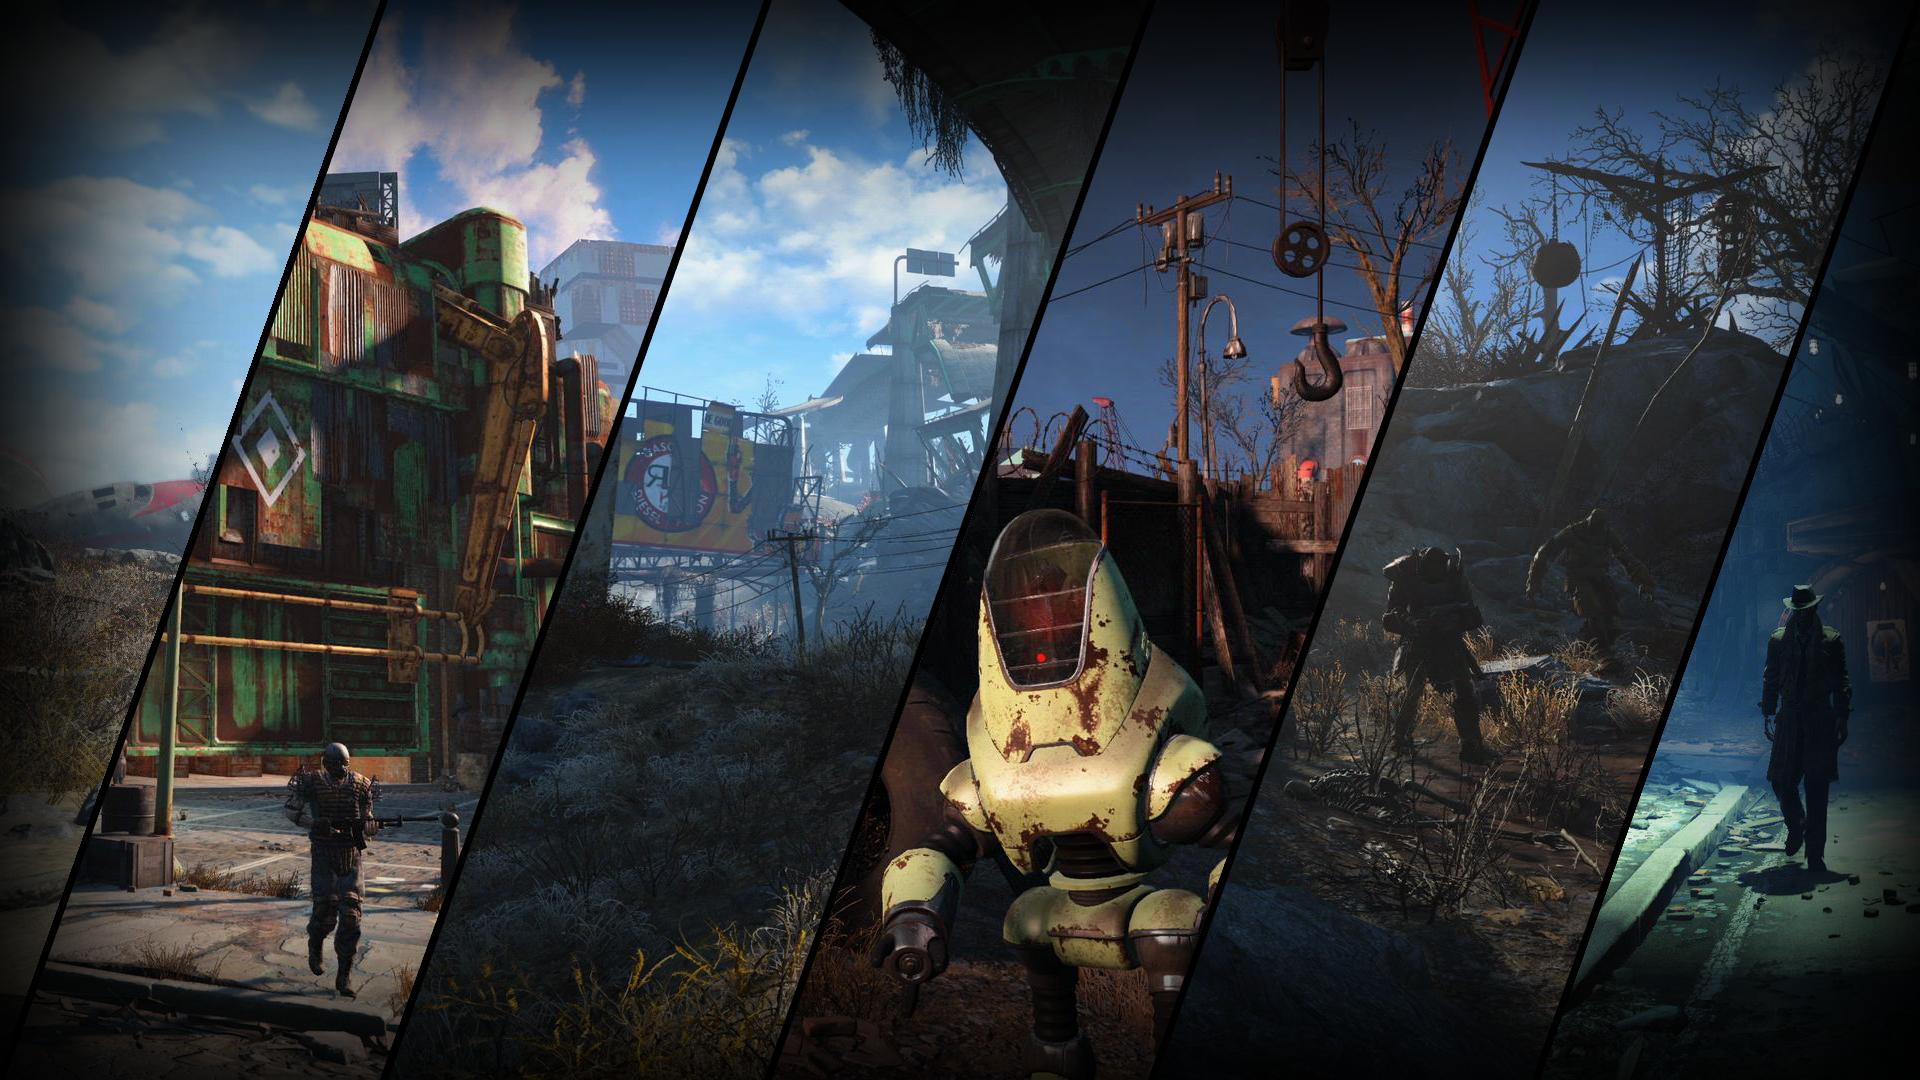 Fallout 4 Wallpaper Hd - Fallout 4 HD PNG